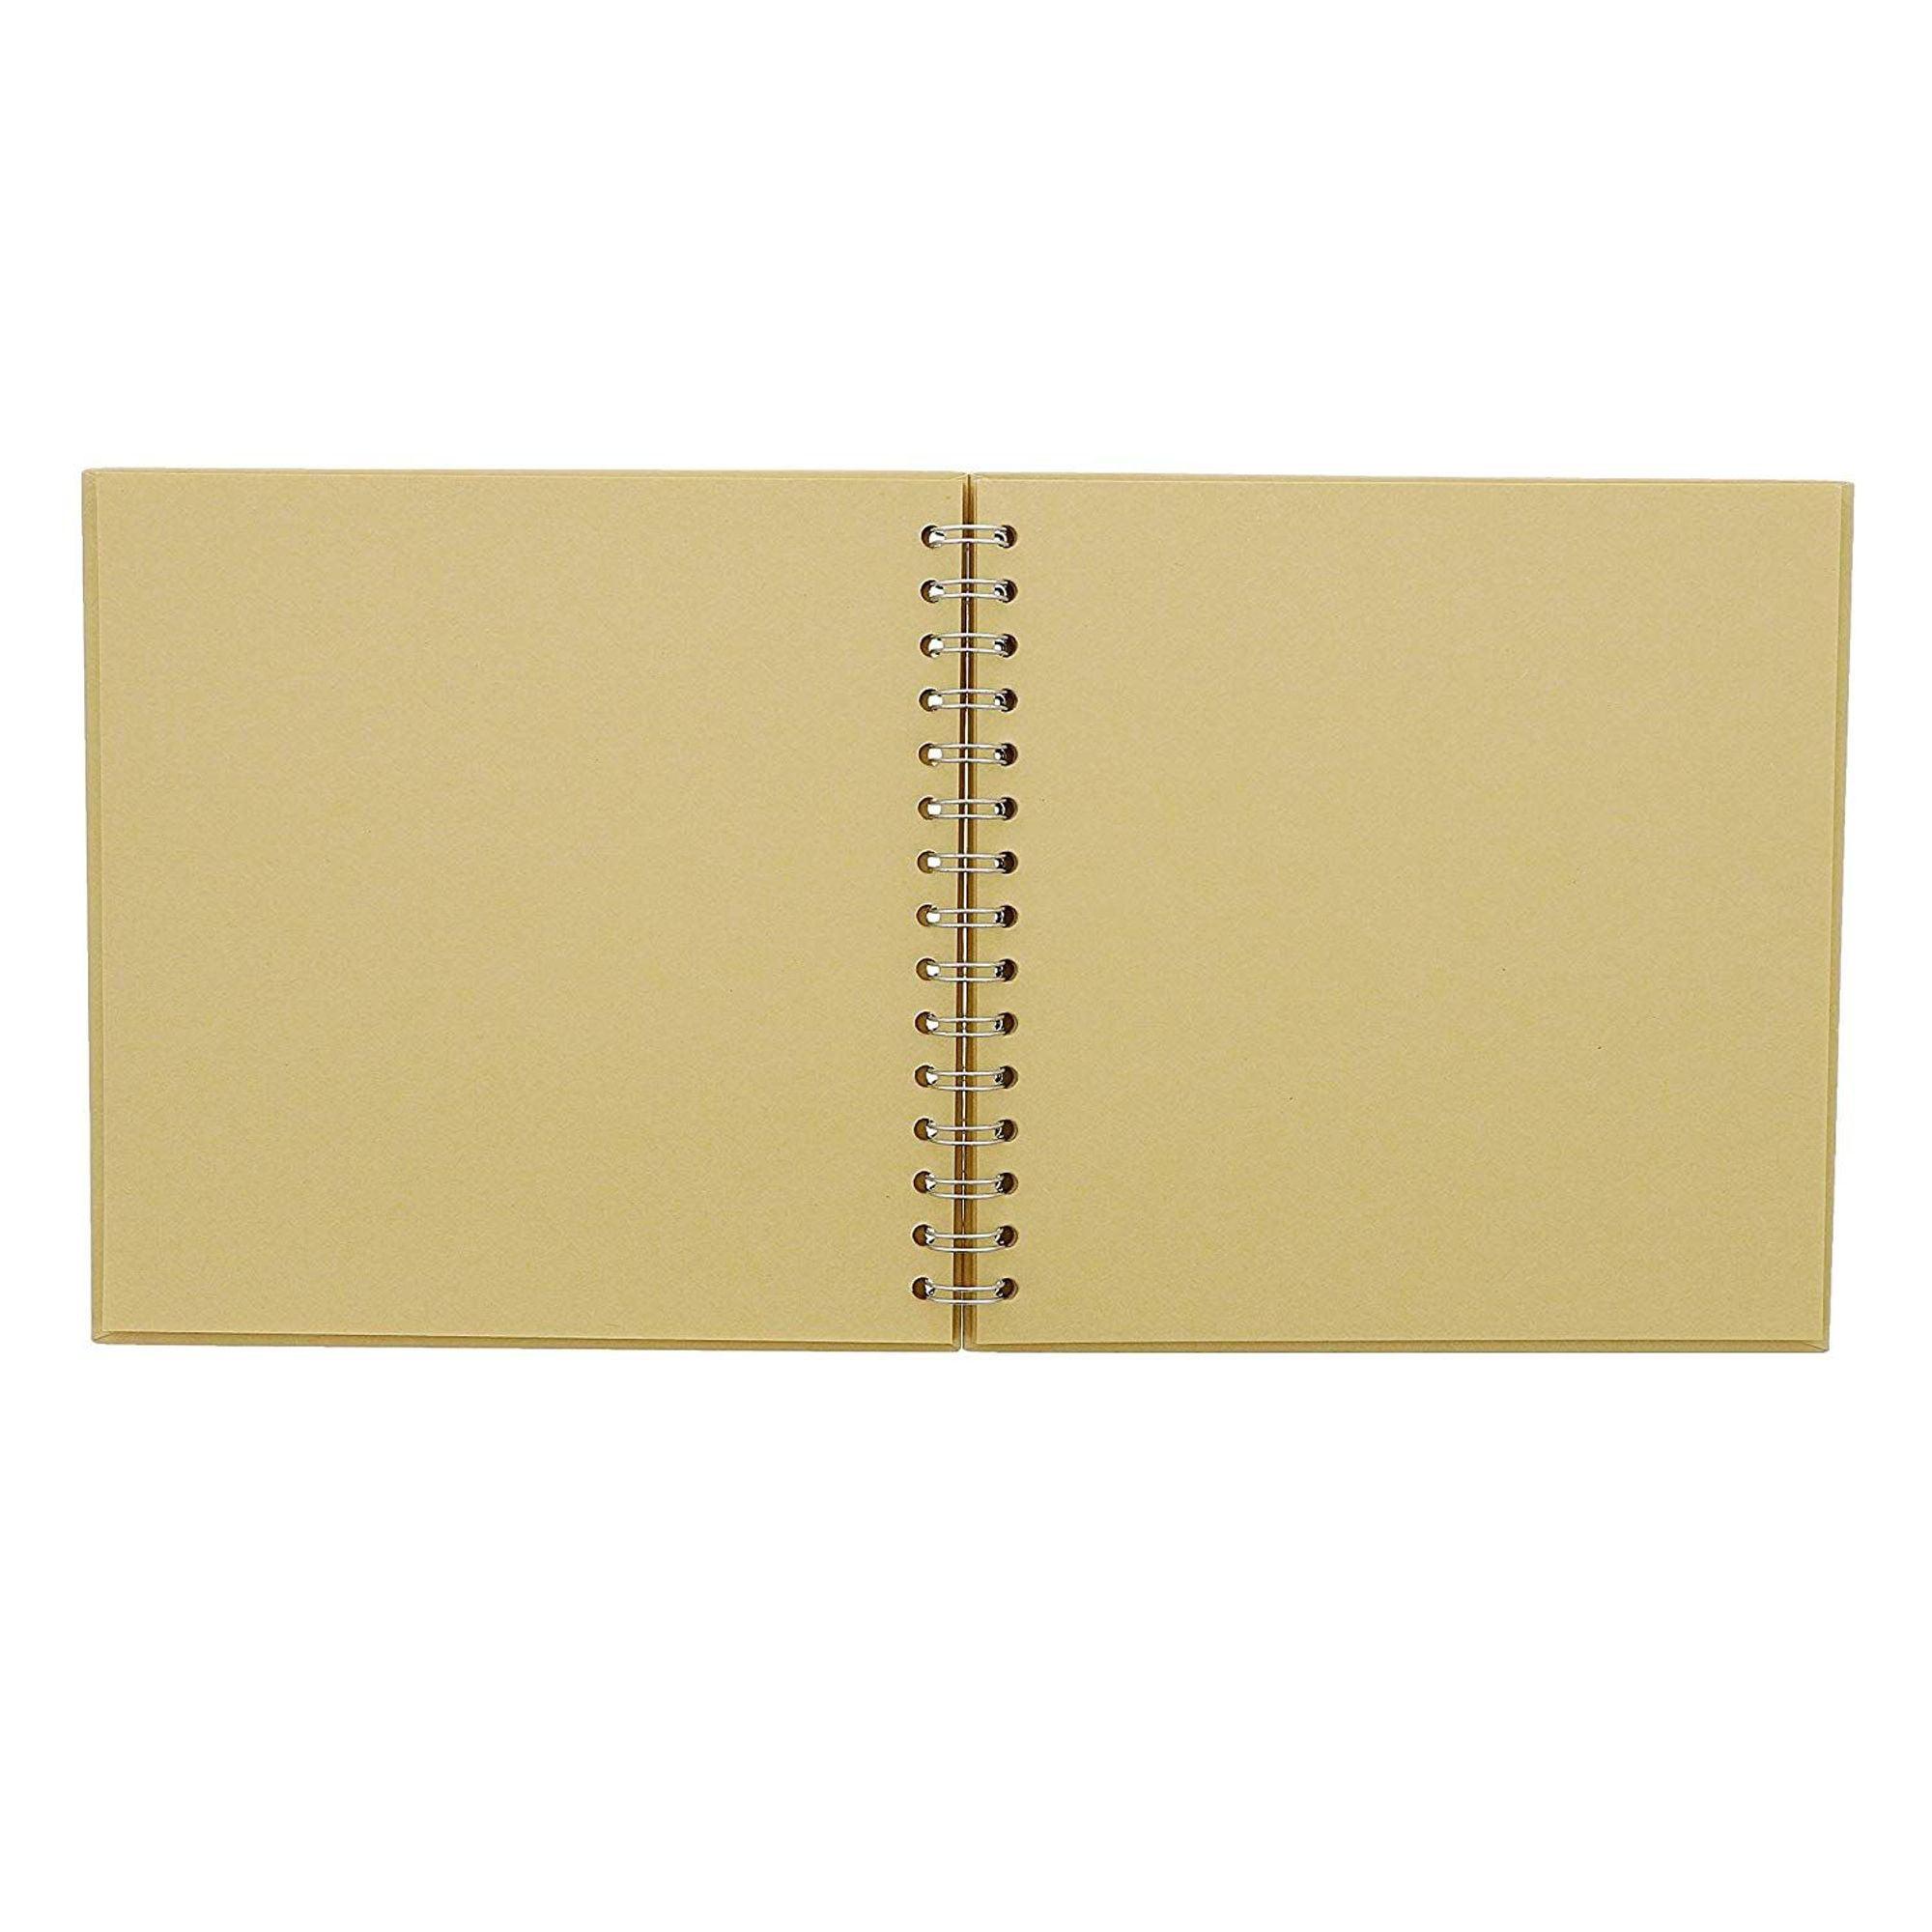 "40 Sheet 80 Pages Hardcover Scrapbook for DIY Handmade Photo Album 13/"" x 8.25/"""